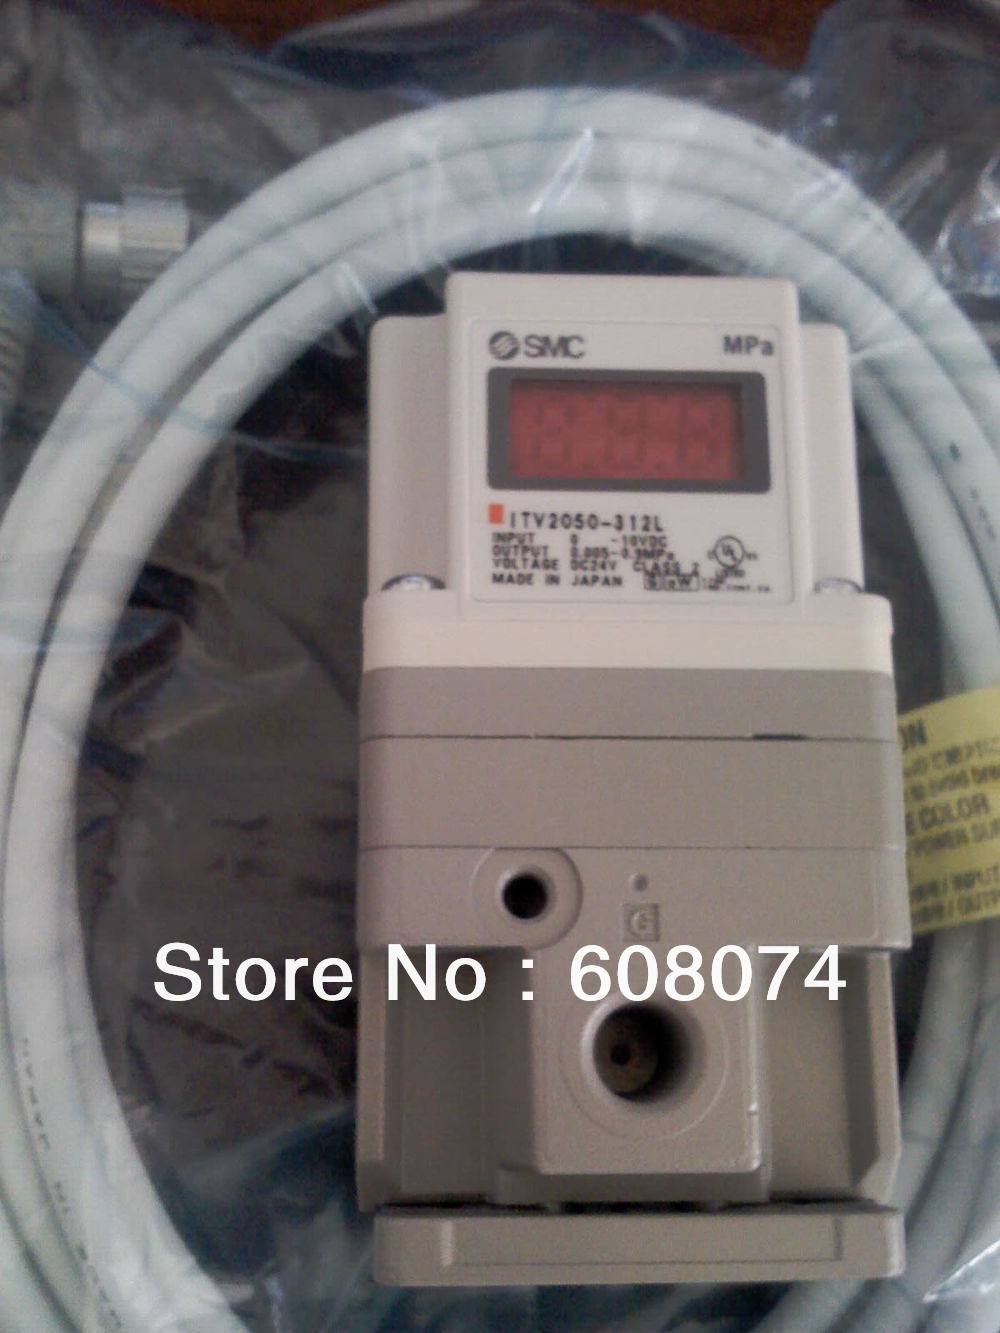 ITV2030-312L ELECTRO/PNEUMATIC REGULATOR, 24VDC 1/4 PORT 0~10V INPUT itv2030 312l electro pneumatic regulator 24vdc 1 4 port 0 10v input